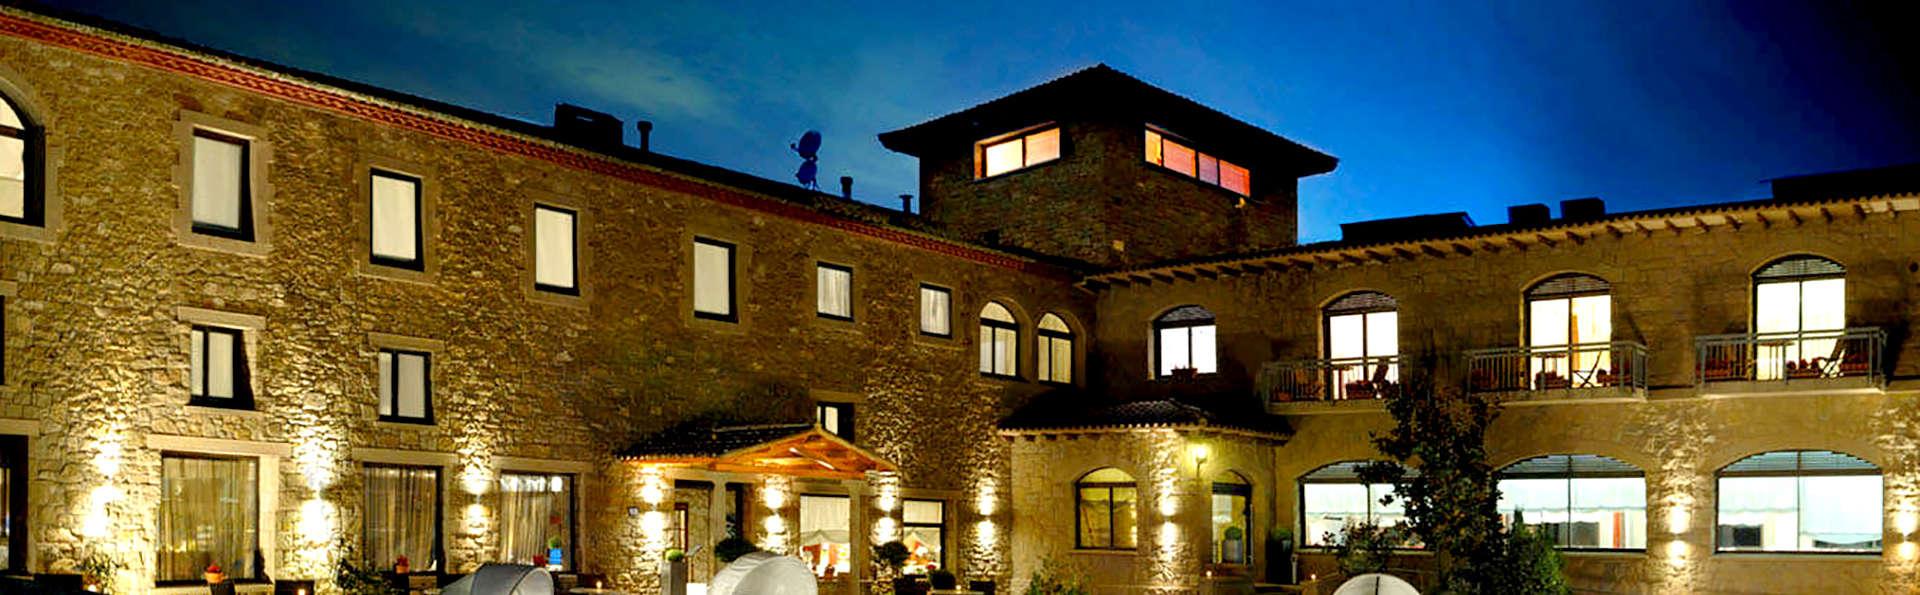 Hotel Urbisol - Edit_Front.jpg